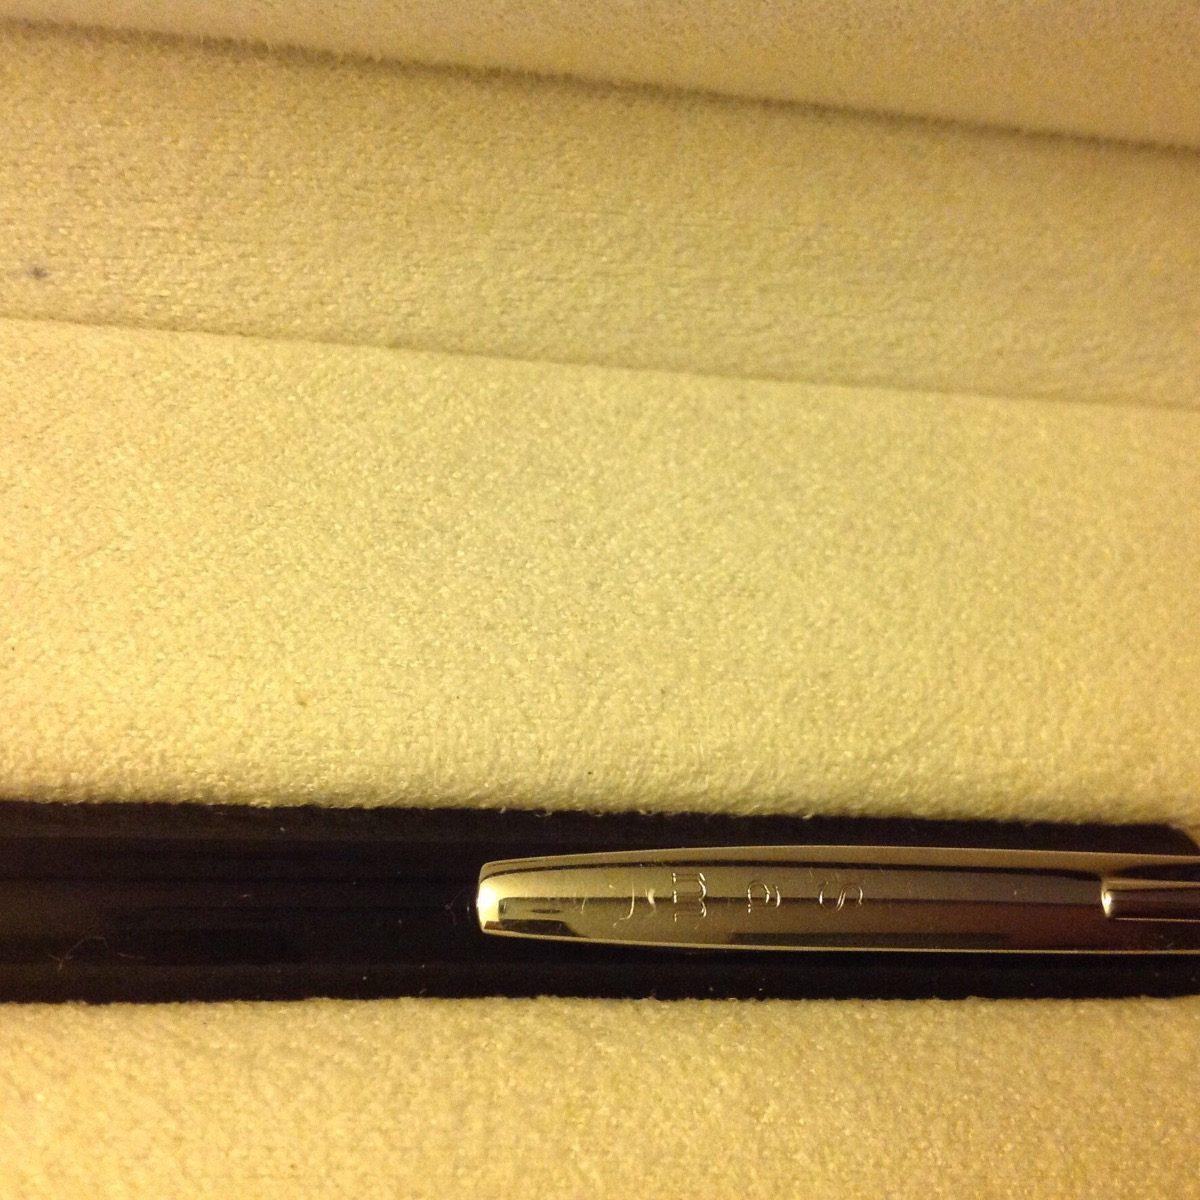 97c6fc0afa3 caneta montblanc starwalker esferografica nome gravado. Carregando zoom.